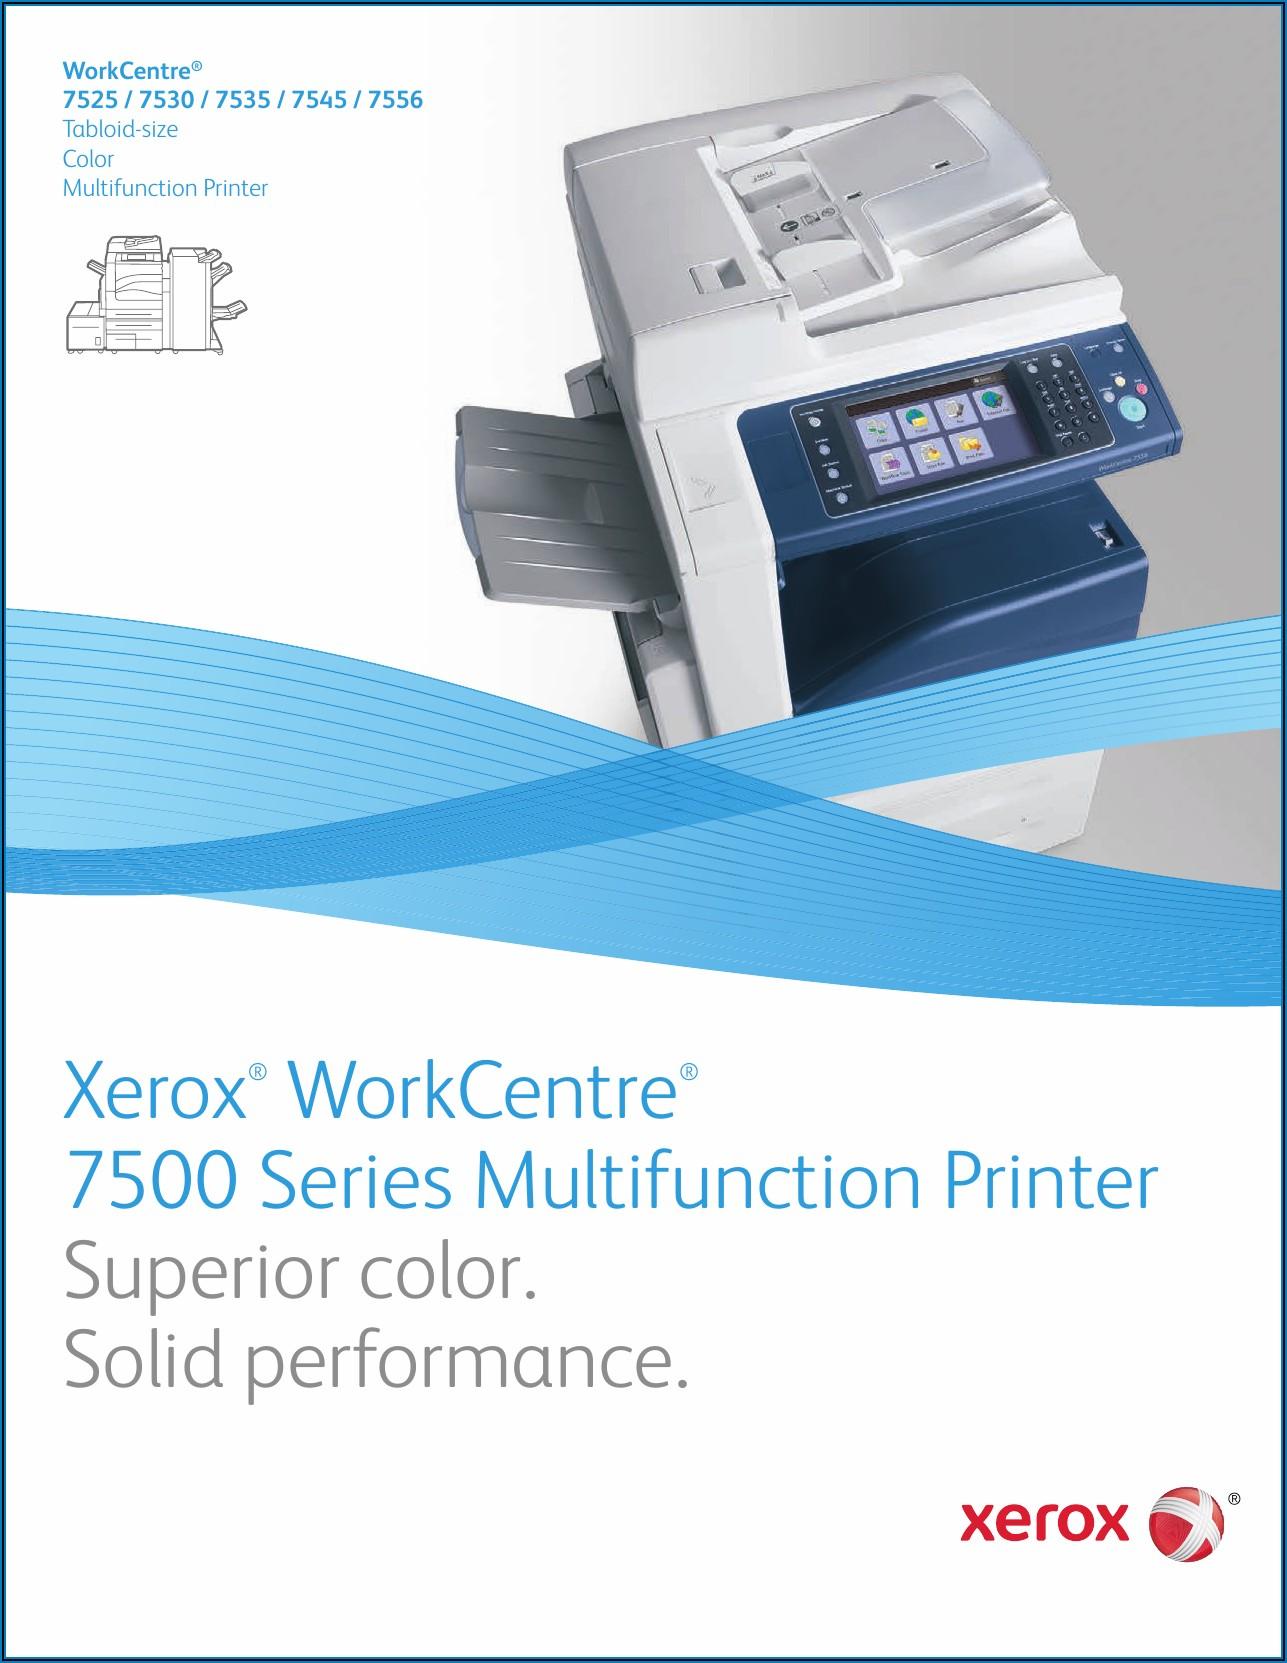 Xerox Wc 7535 Brochure